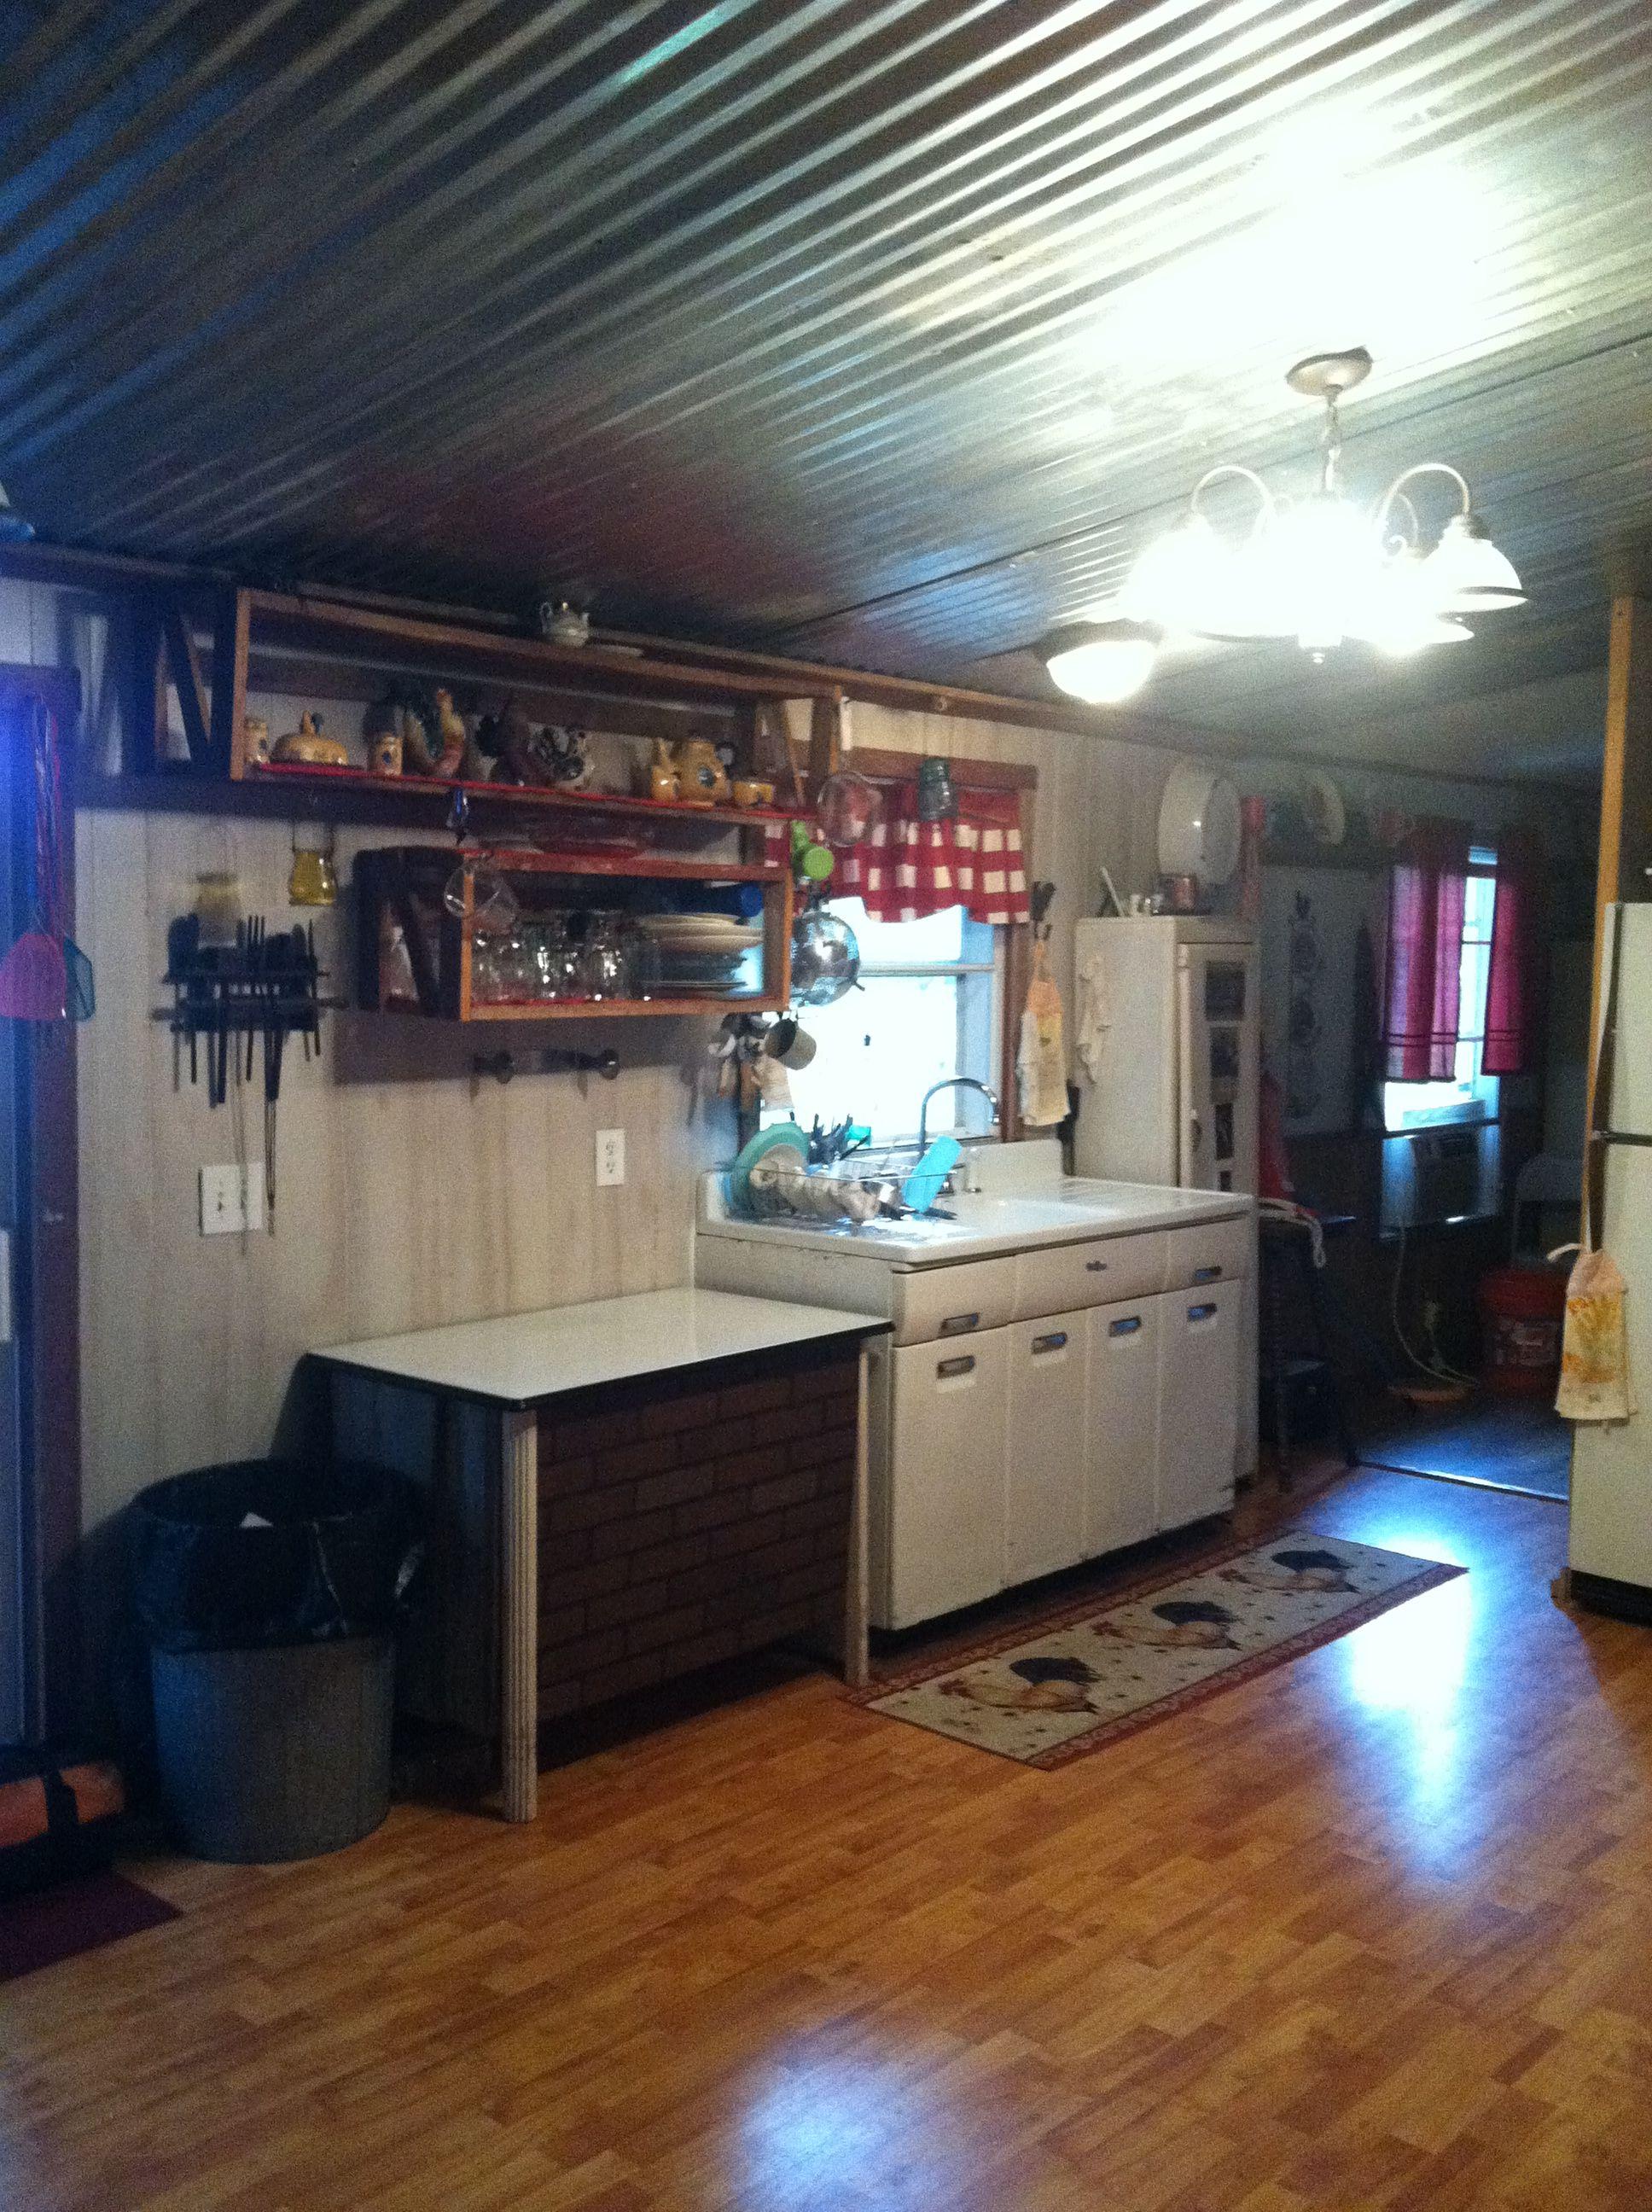 KITCHEN IN MOBIL HOME REMODEL